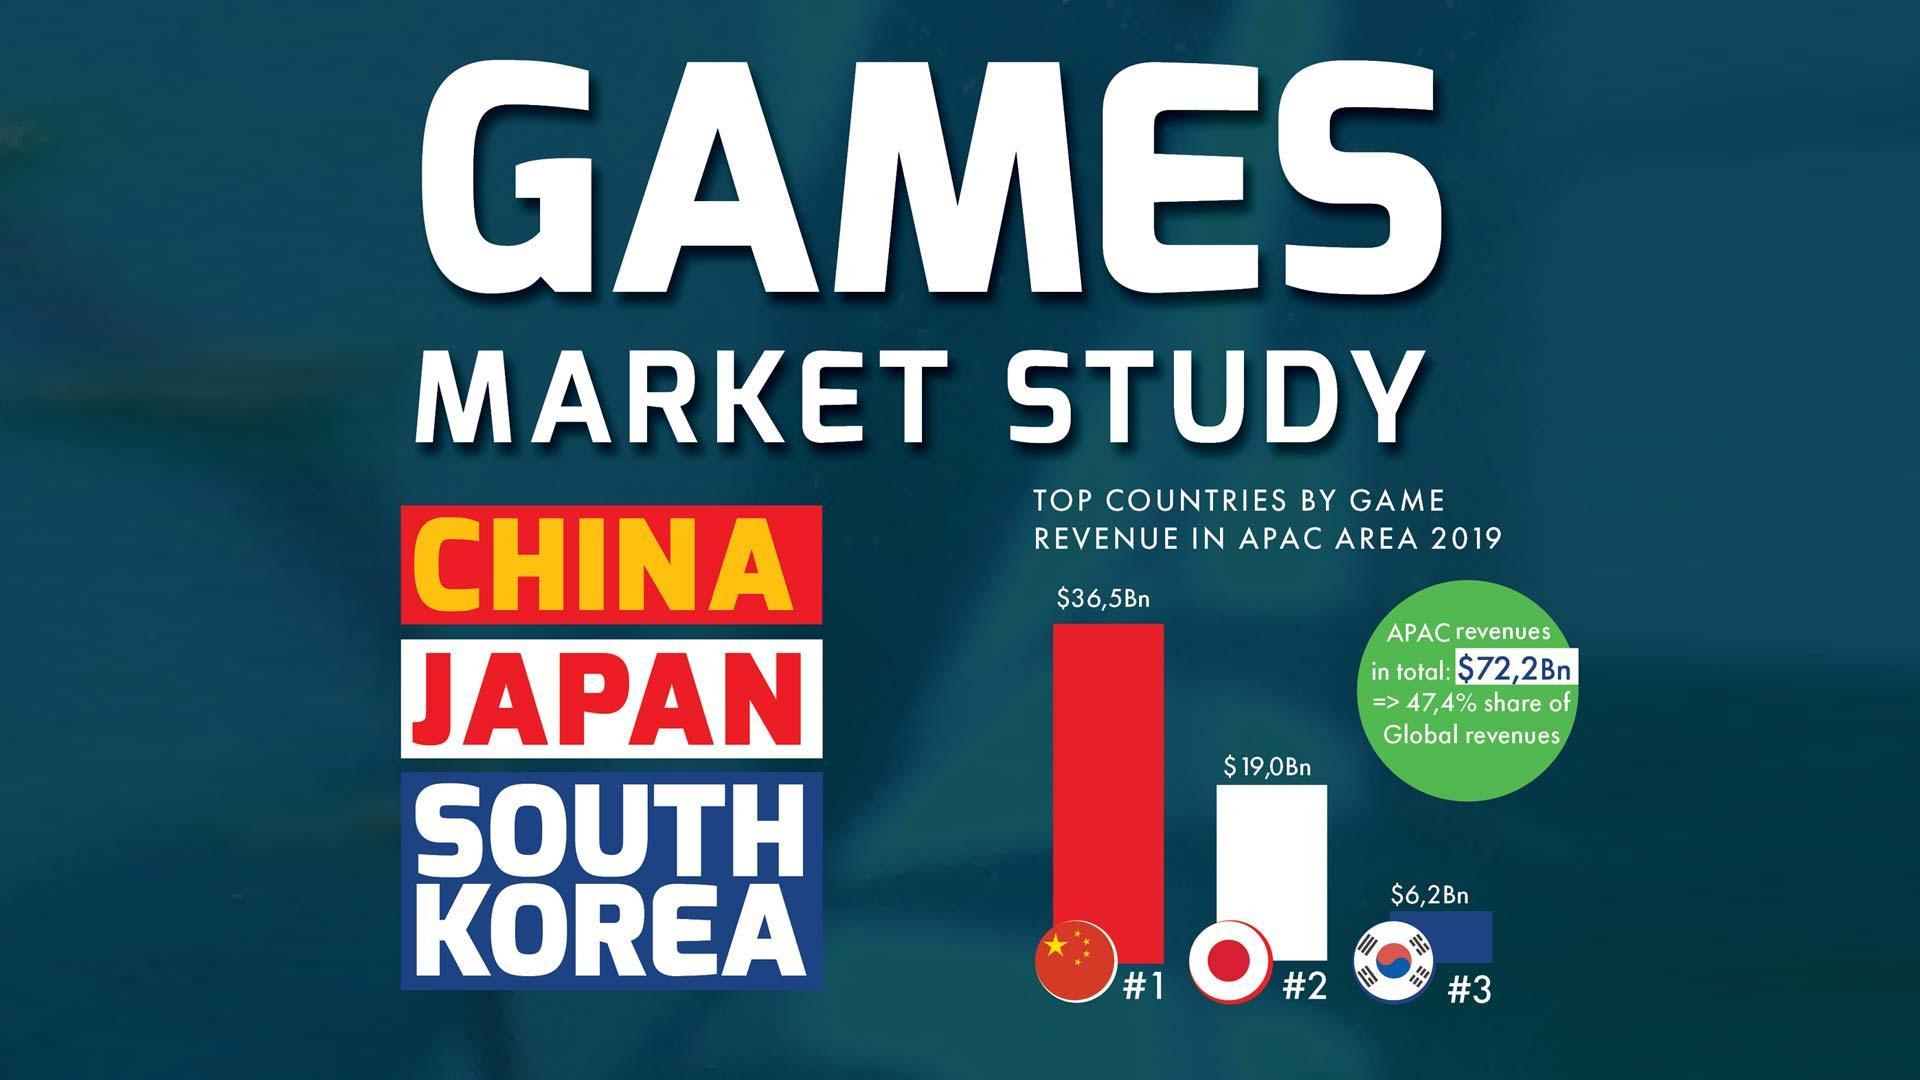 Games Market Study China Japan South Korea